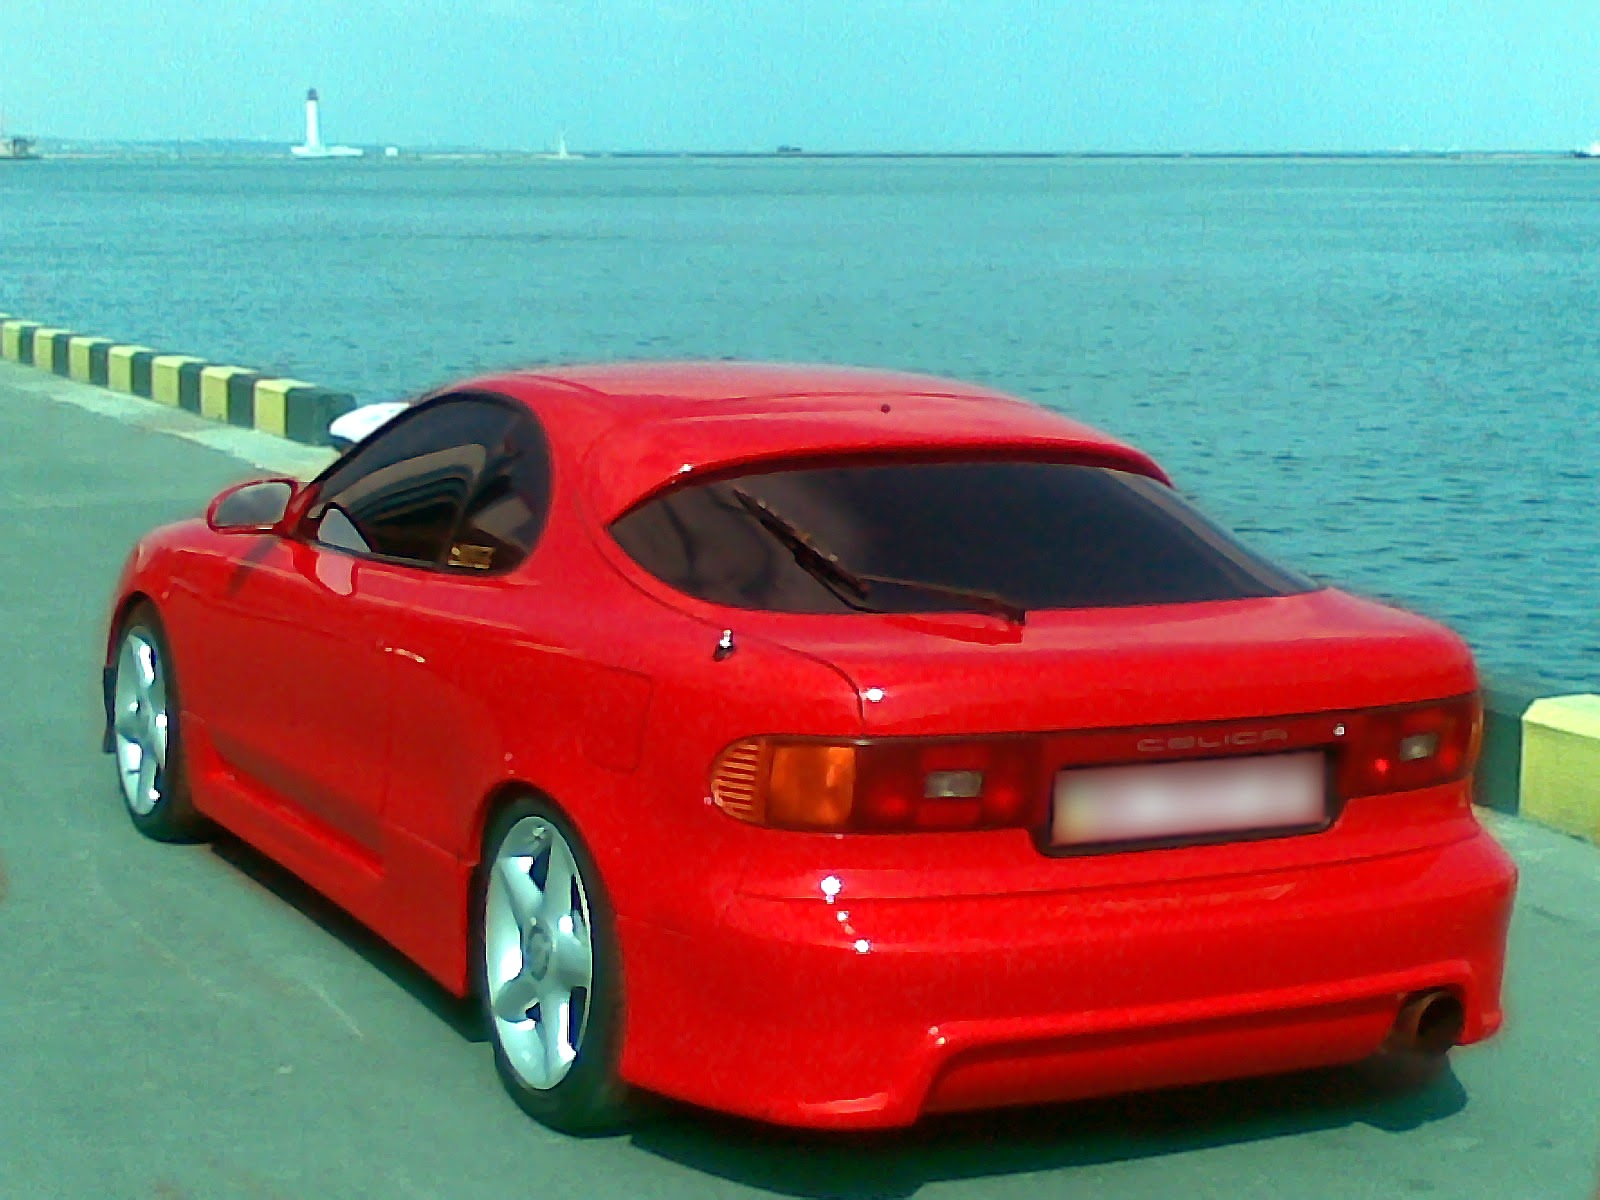 http://1.bp.blogspot.com/-OeZ8XueZOAs/TzfE6gukSnI/AAAAAAAAC-4/i87d1iBarME/s1600/Toyota_celica_182_red_1990_3s-ge_2.jpg